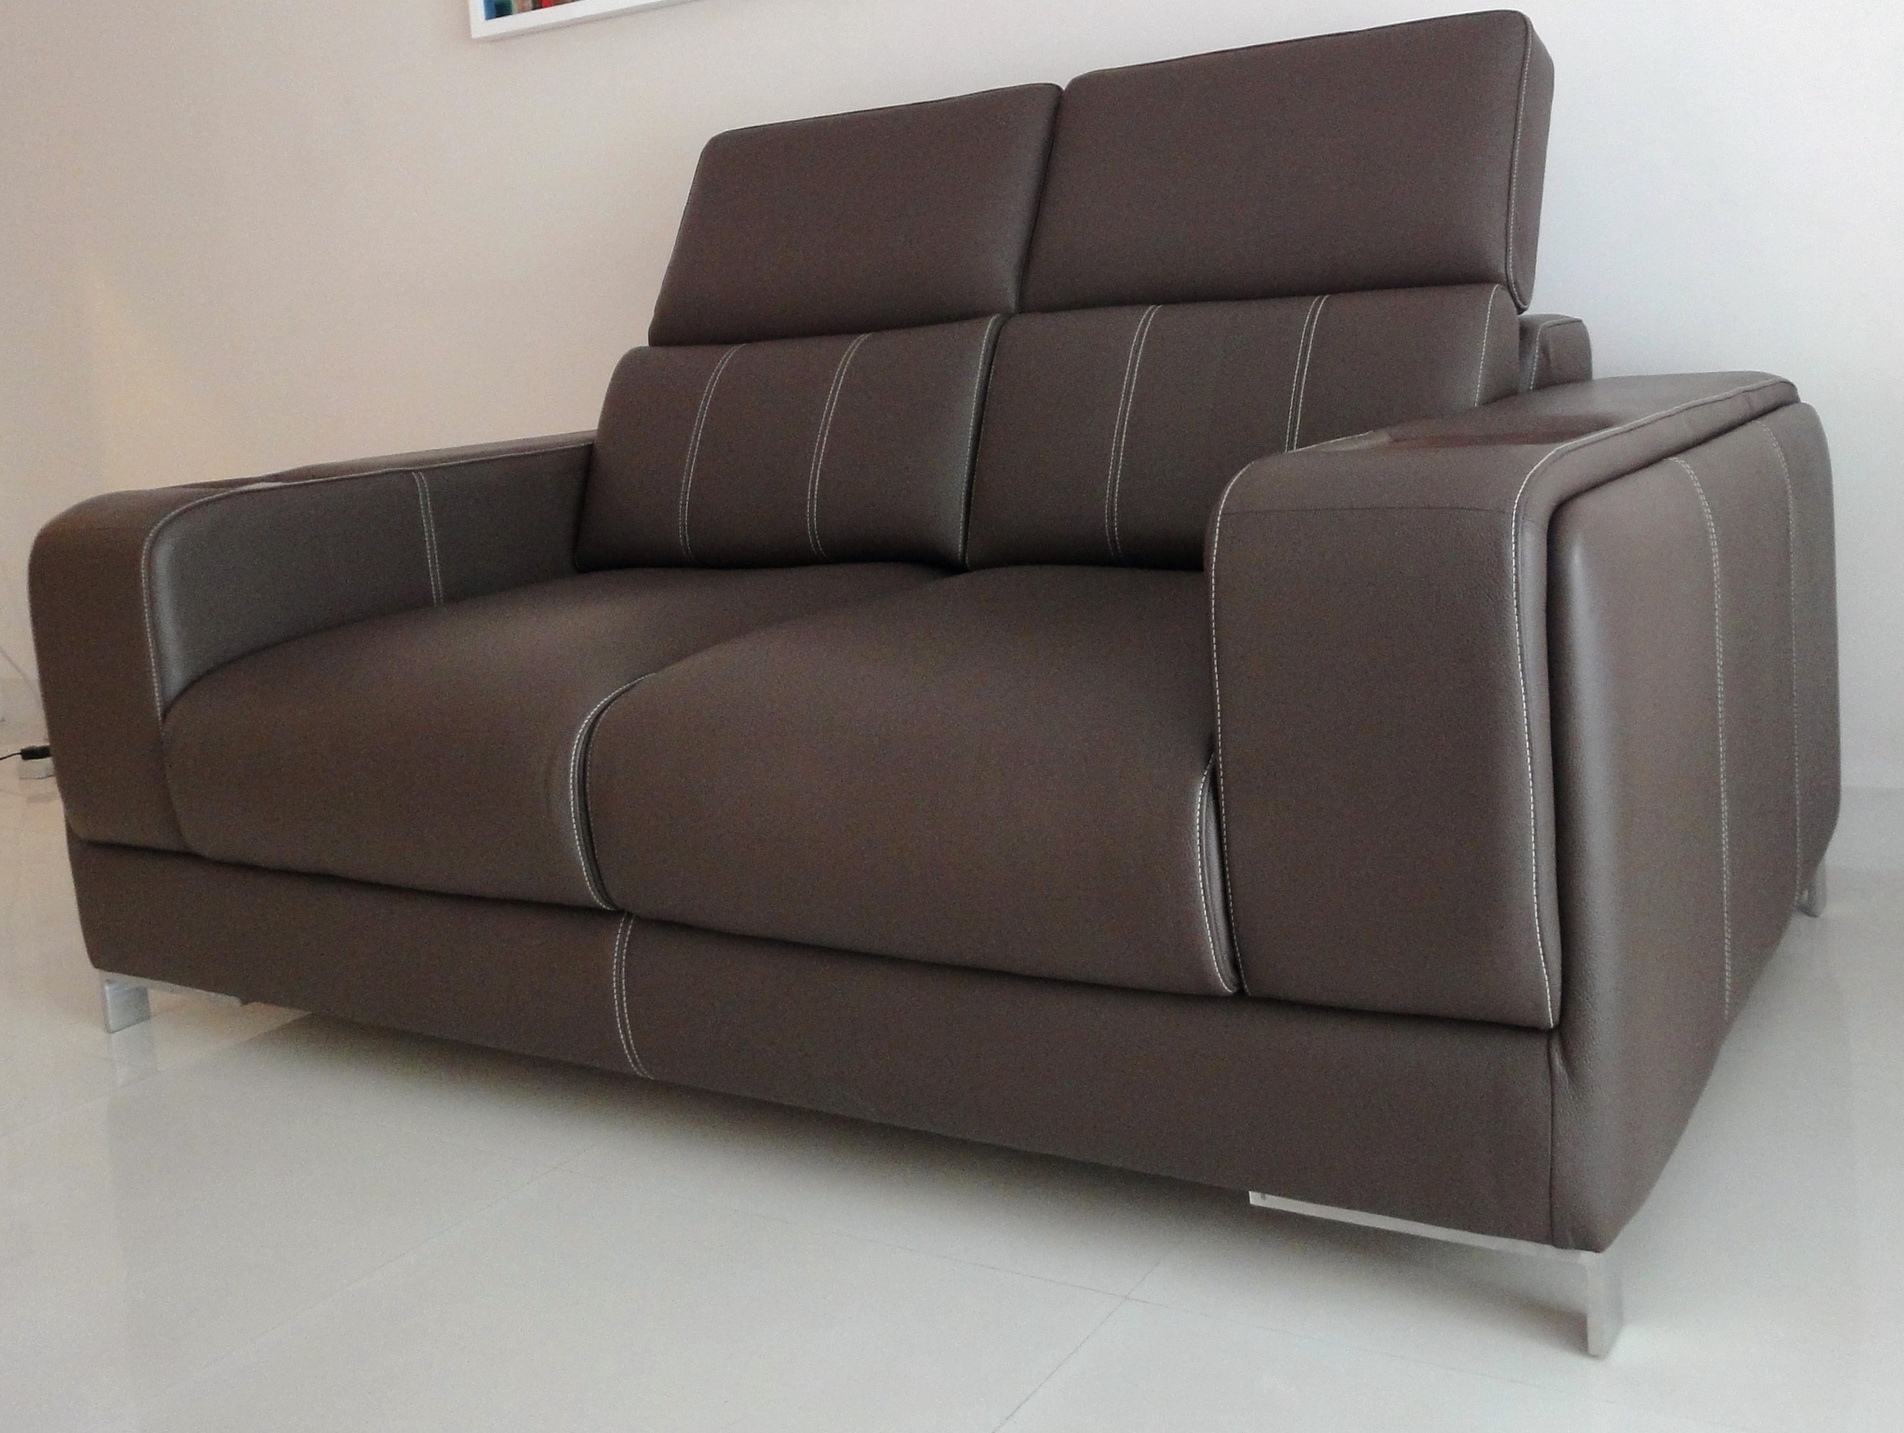 Sofa Seat Cushions Bangalore